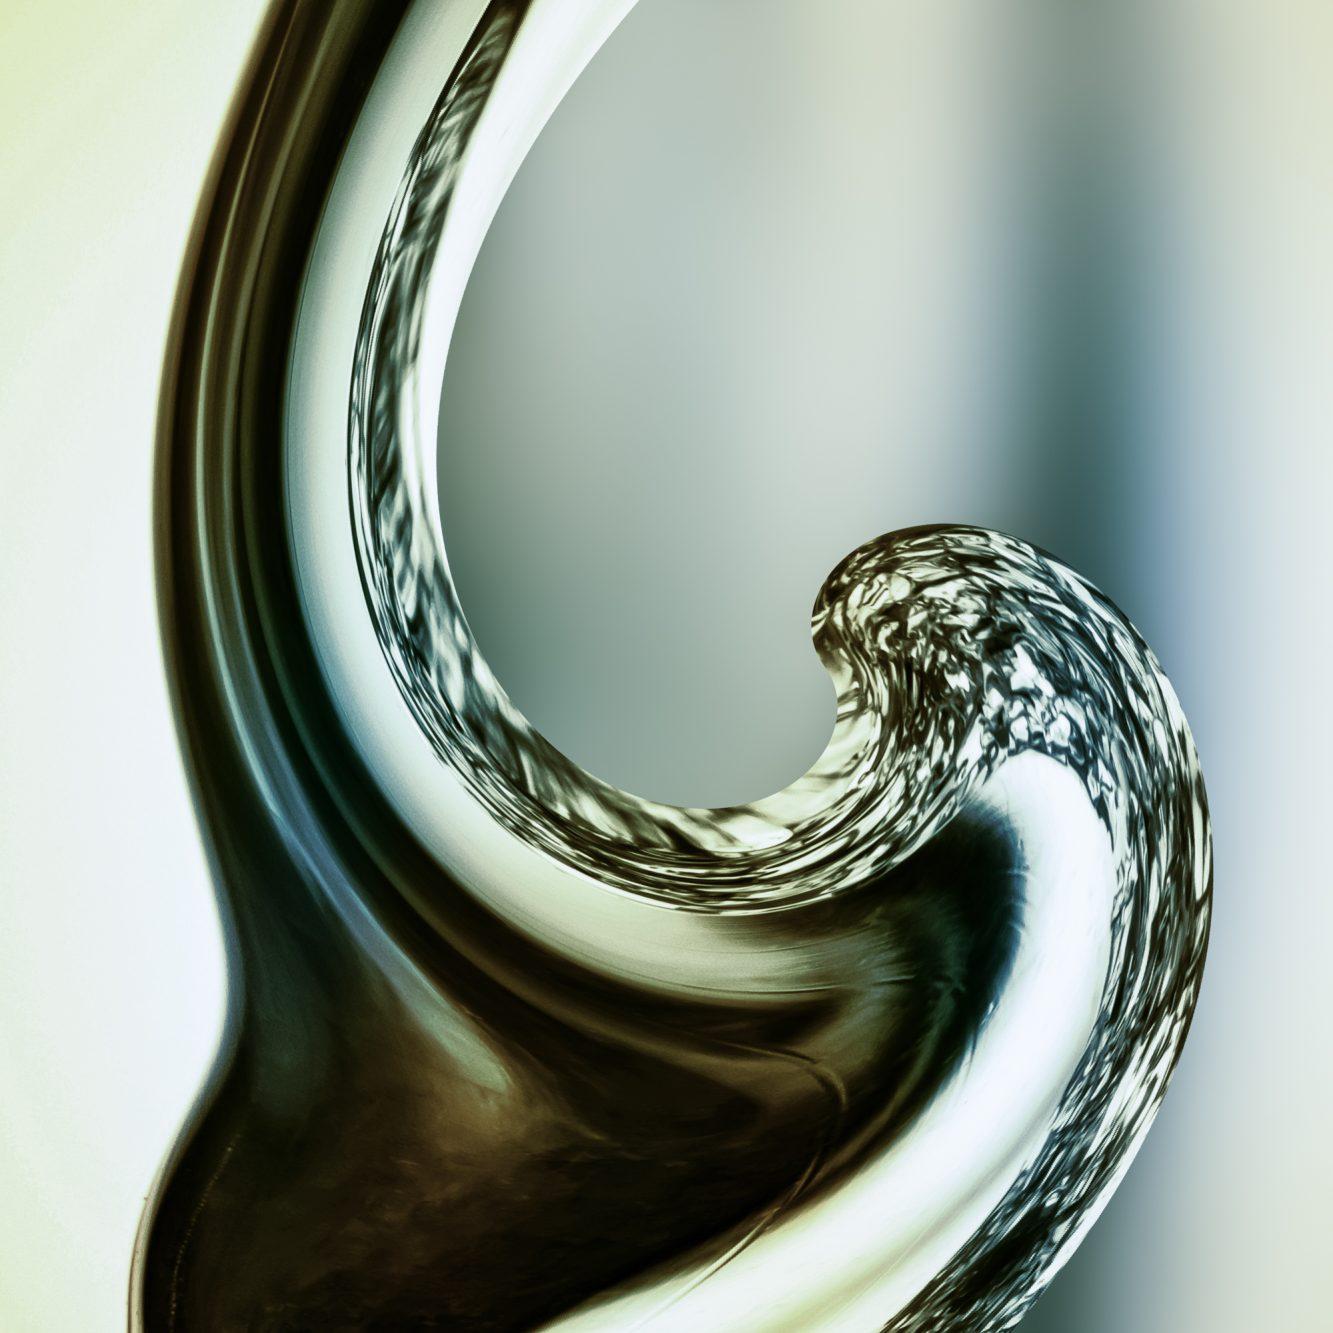 glass-photo-art-213-2